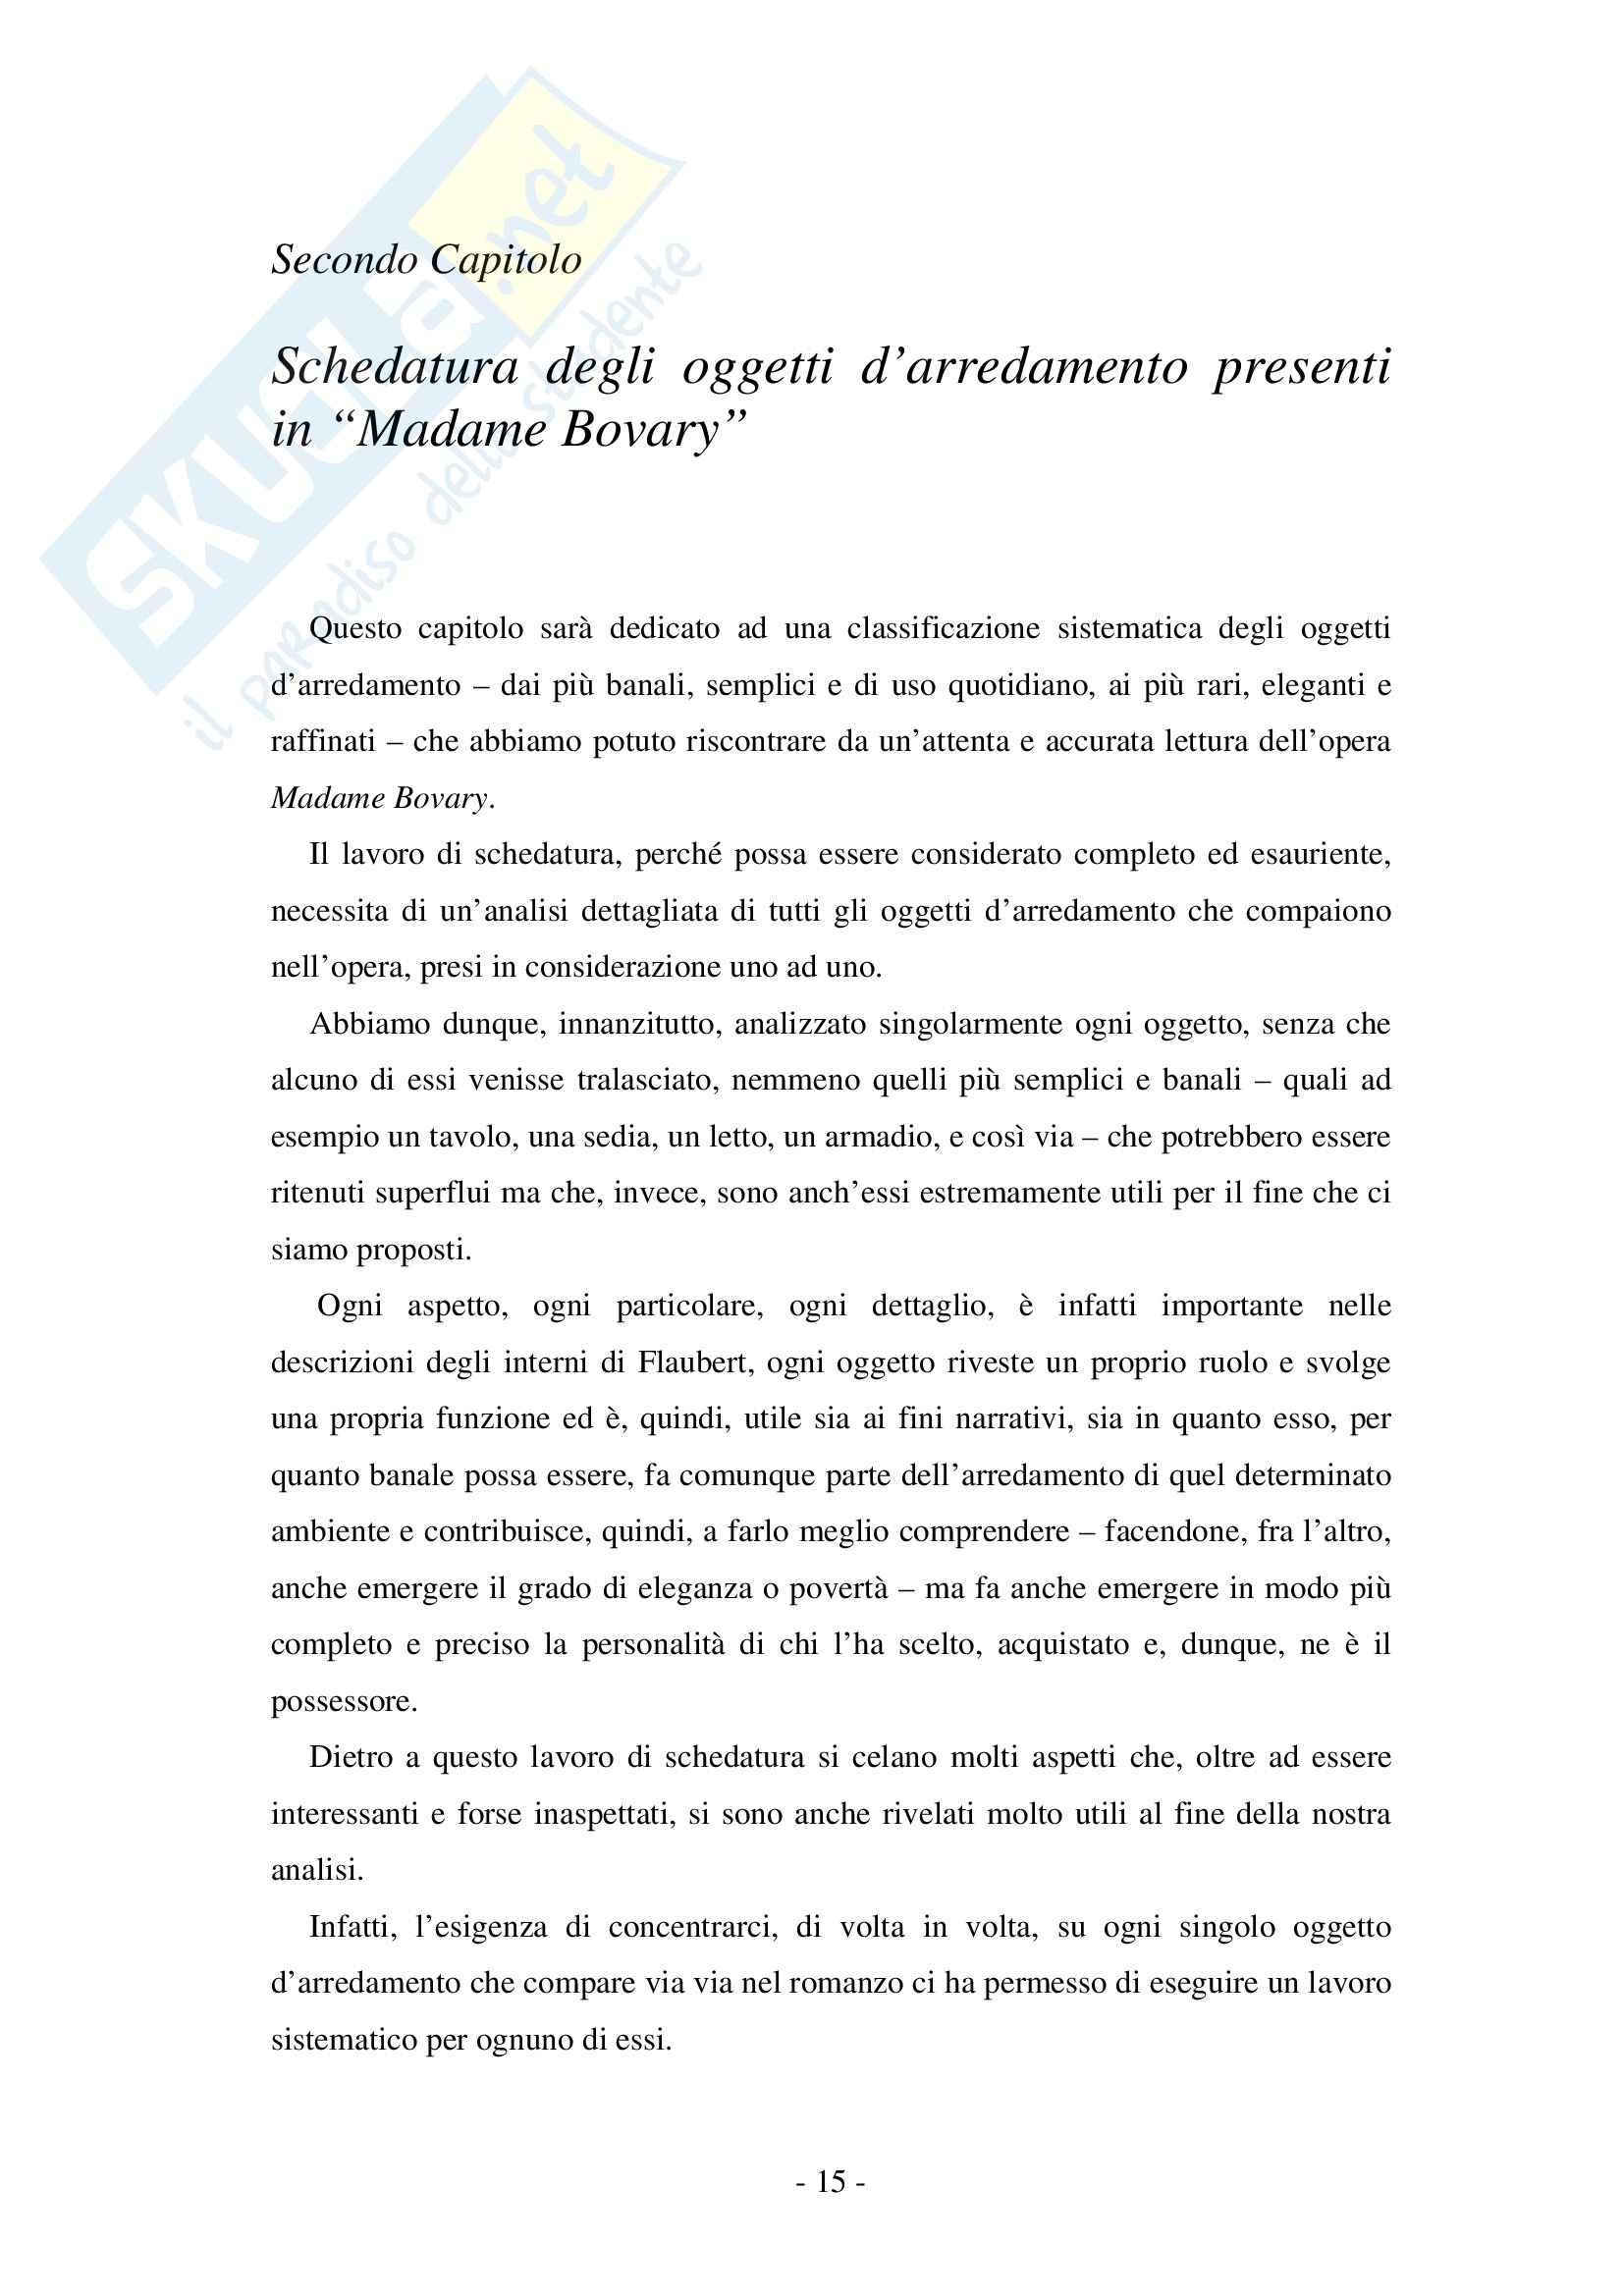 Tesi, Flaubert: il Tema dell'arredamento in Madame Bovary Pag. 16